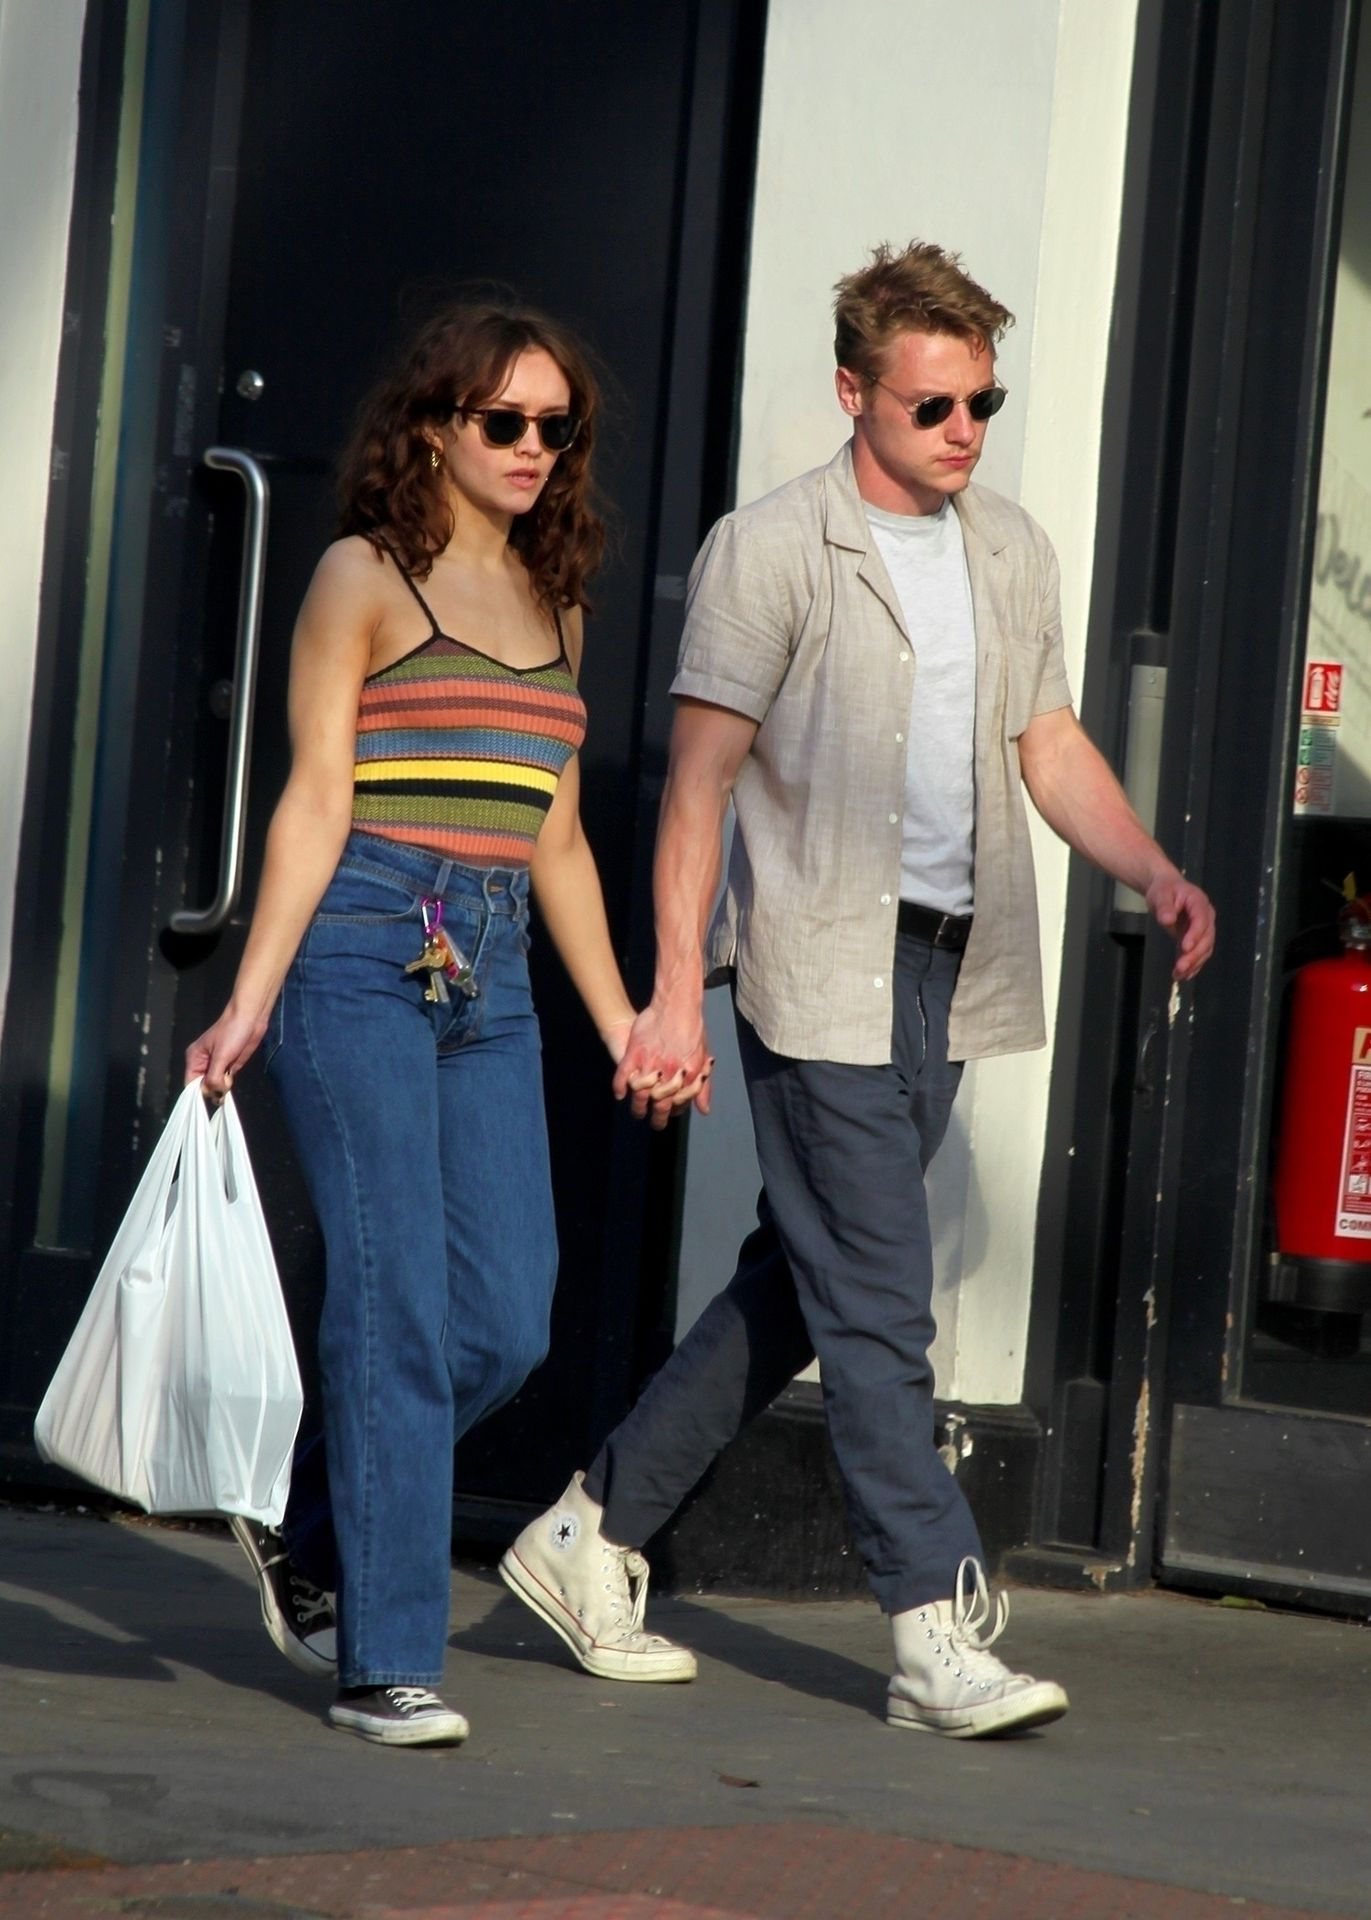 Ben Hardy Walks Hand In Hand With Actress Girlfriend Olivia Cooke 0003